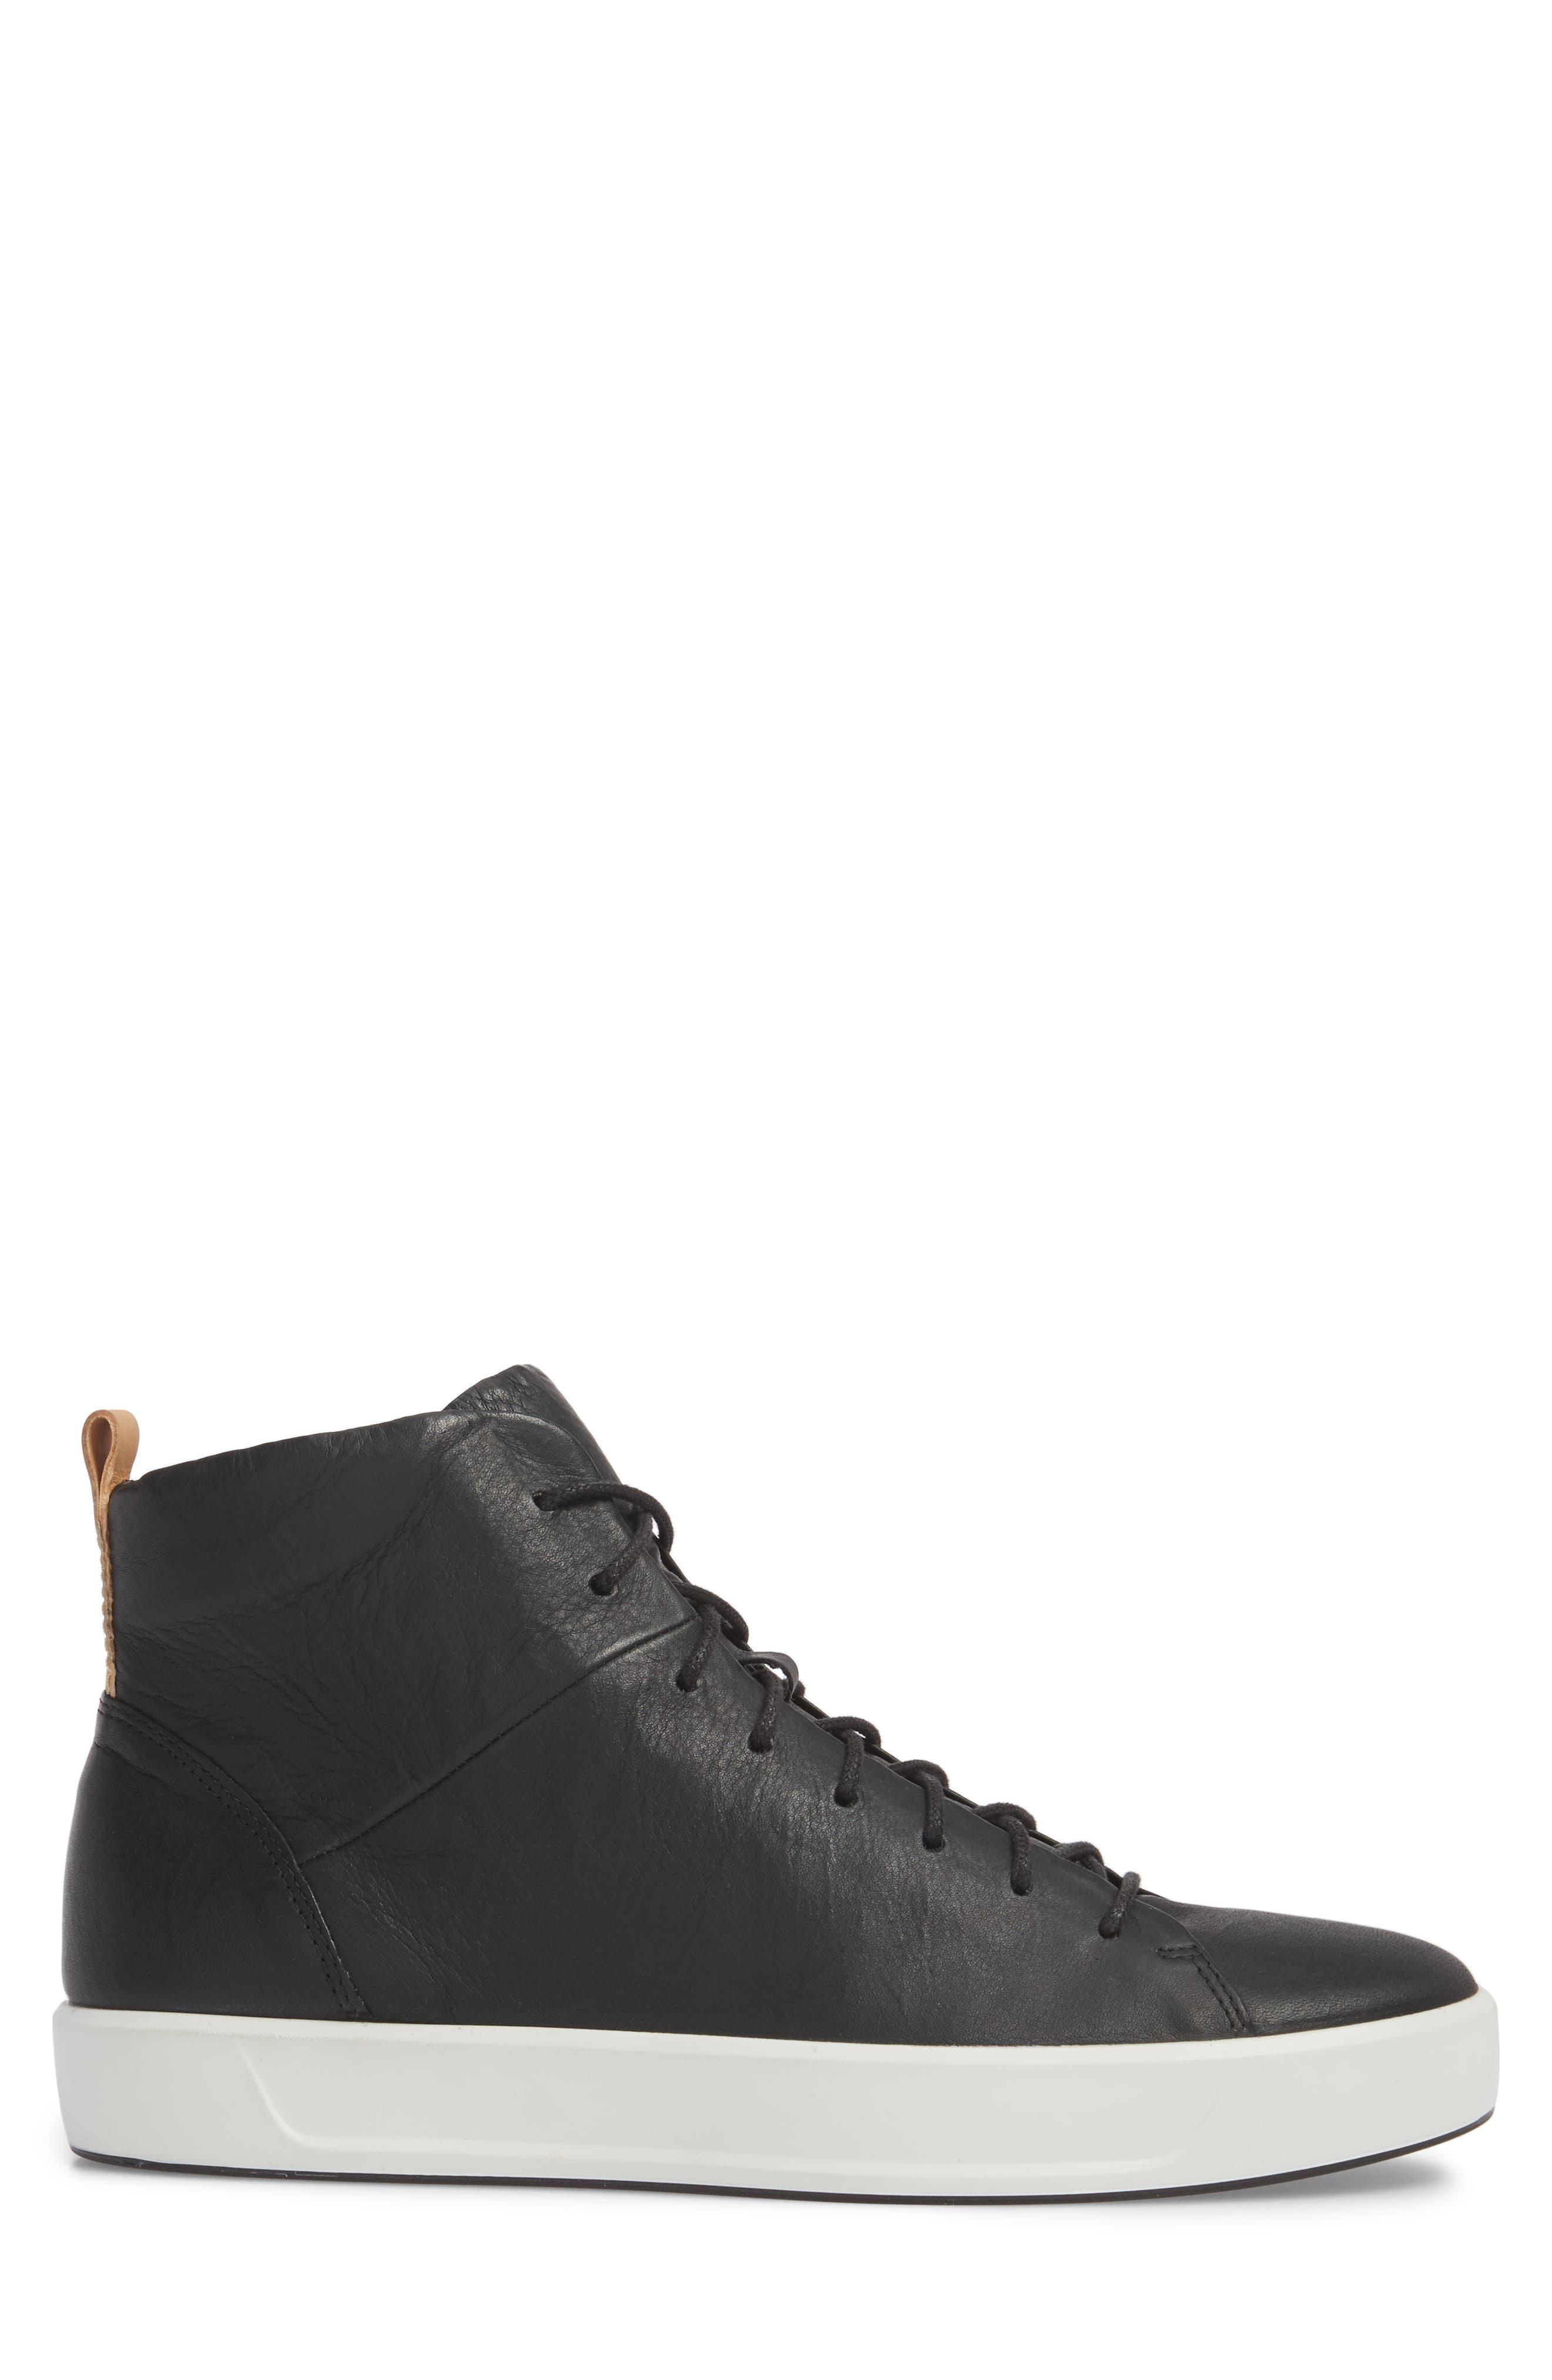 Soft 8 Sneaker,                             Alternate thumbnail 3, color,                             Black/Black Leather